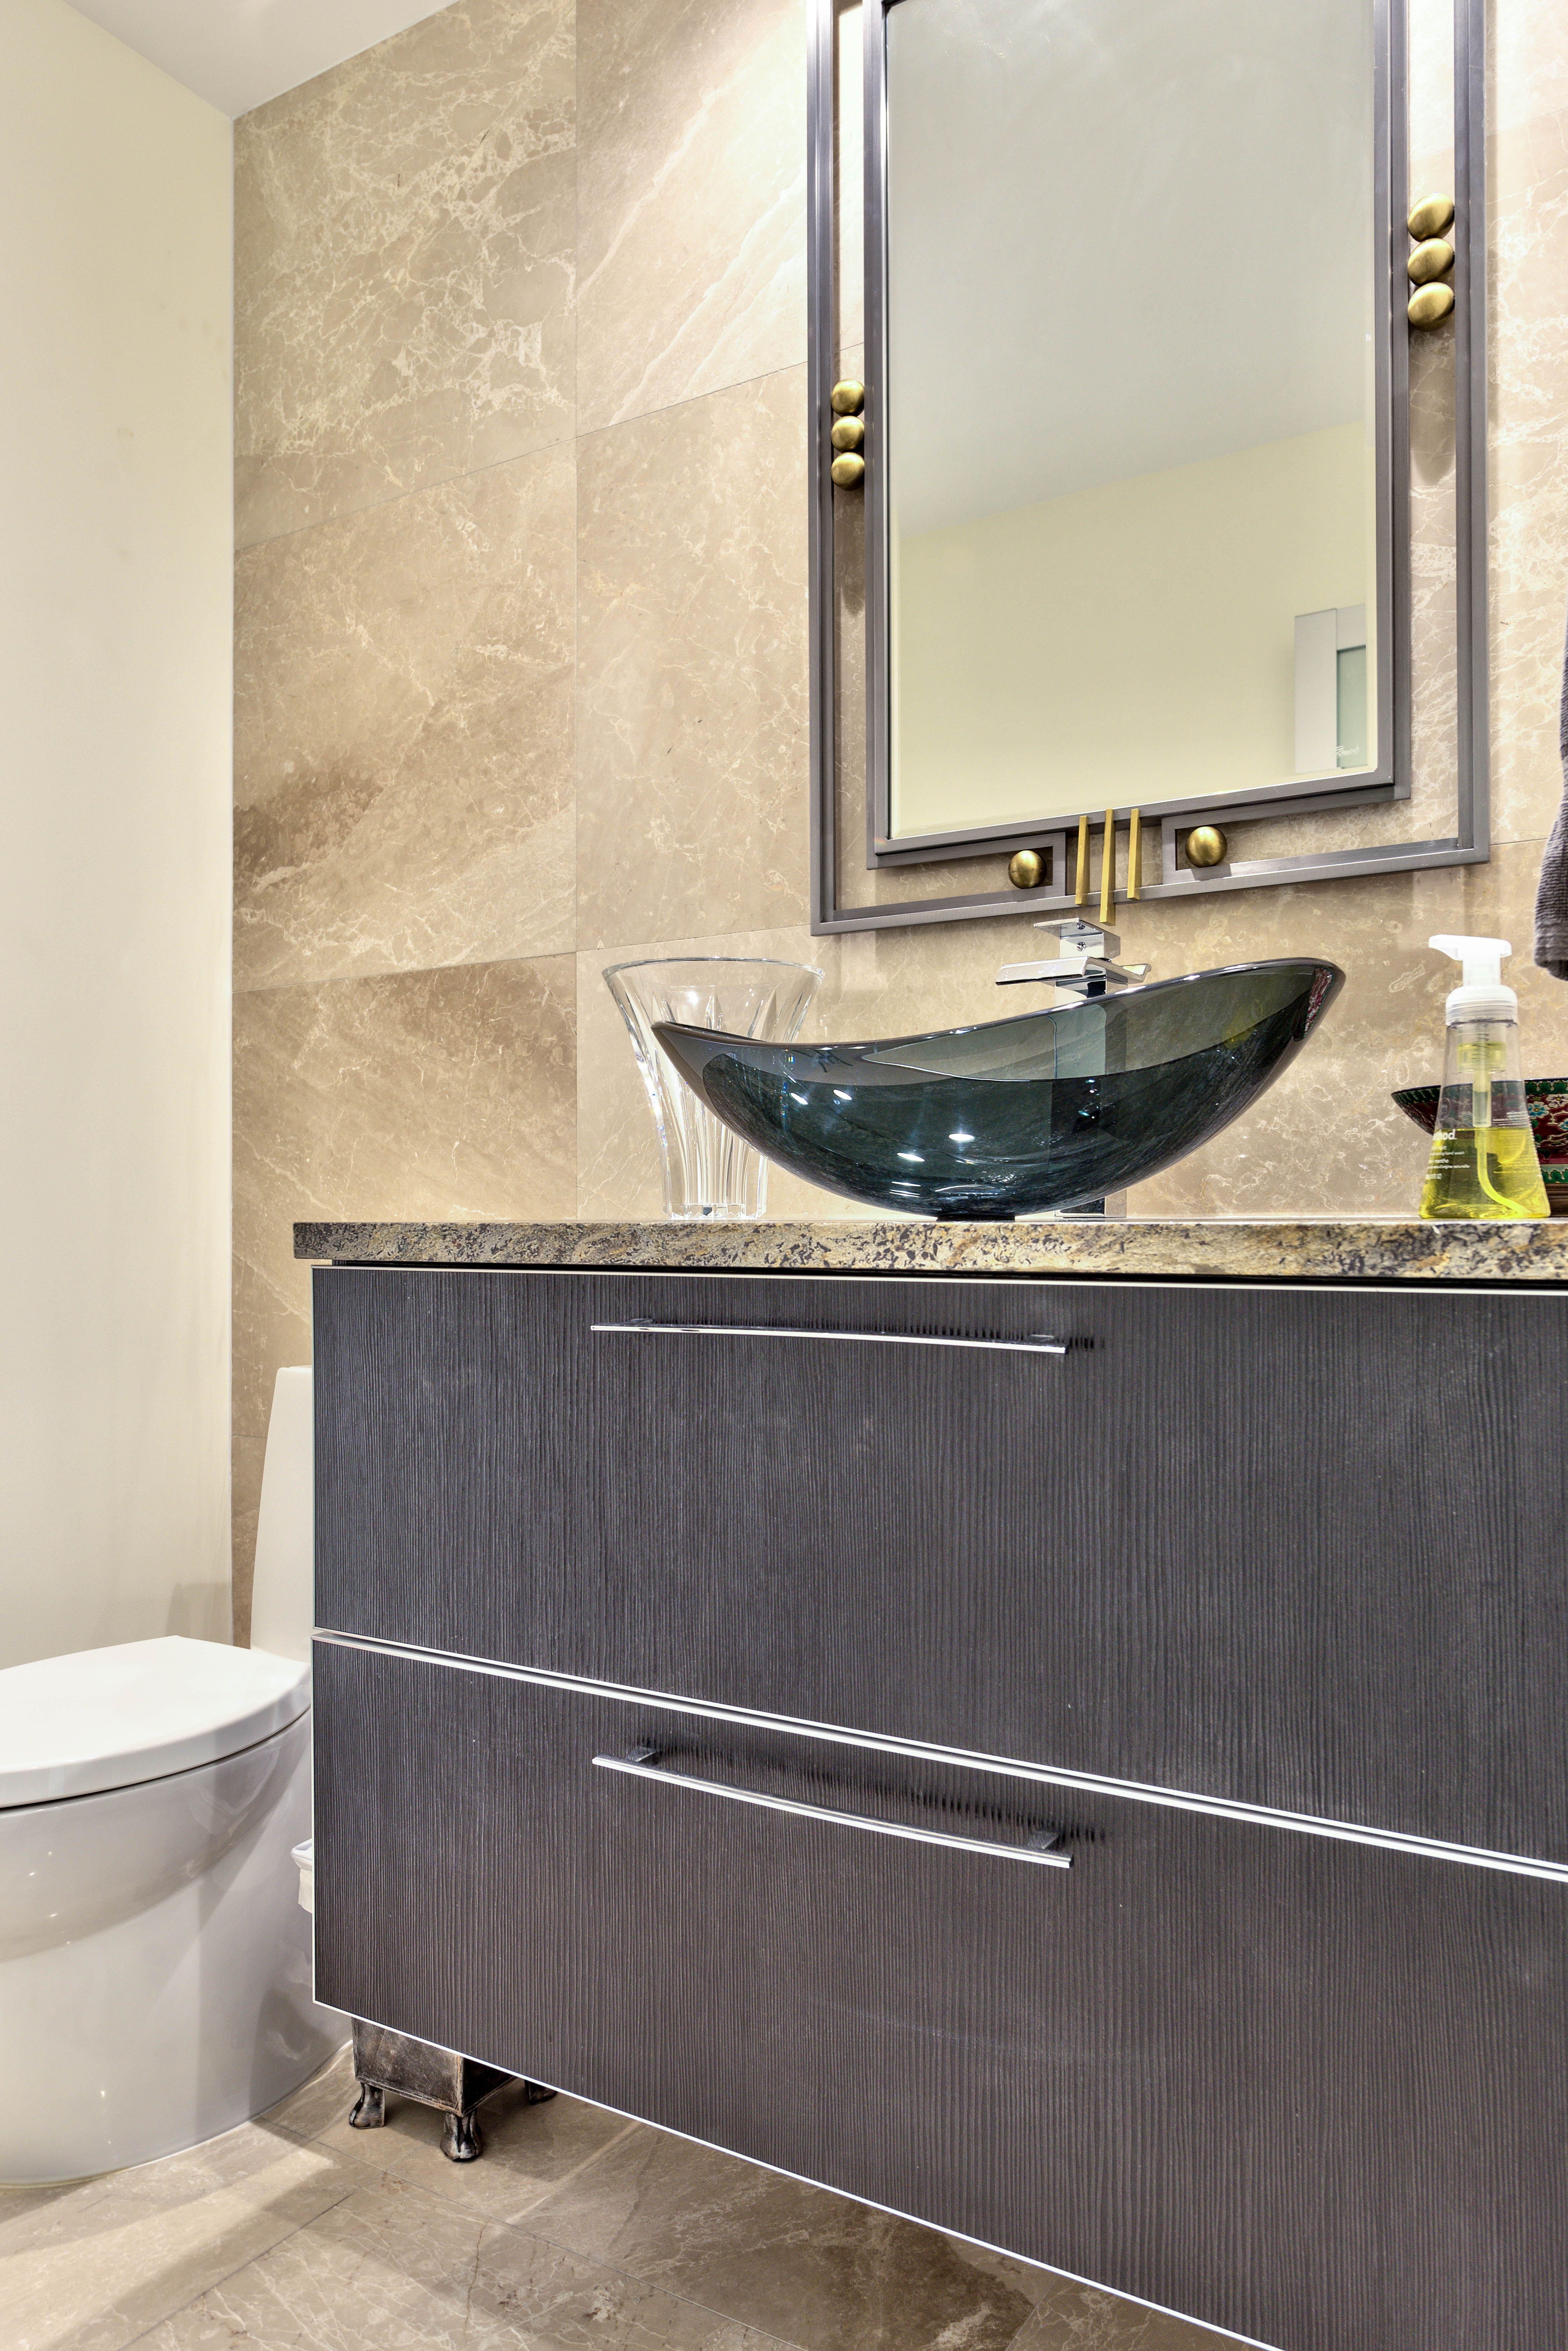 Naples Bathroom Remodeling Projects | Bathroom Remodeling ...